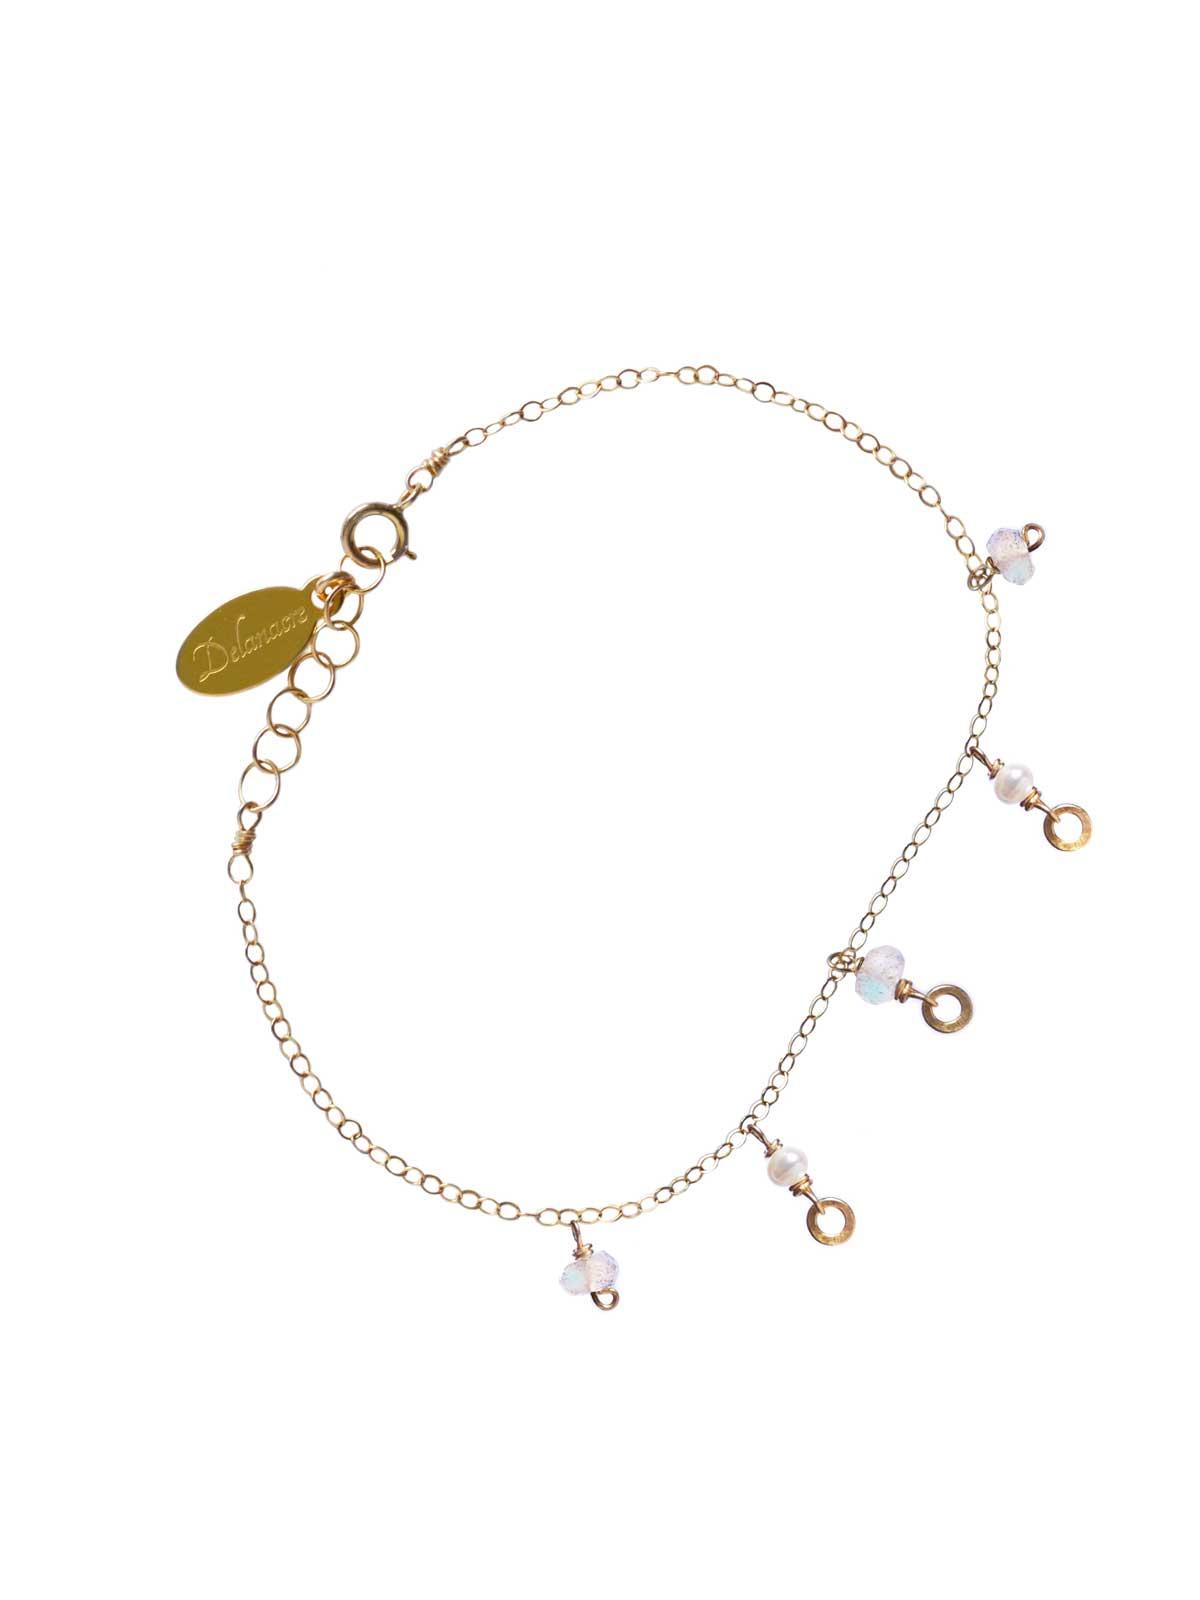 Bracelet 14K Gold-filled chain white Freshwater Pearls faceted Moonstone